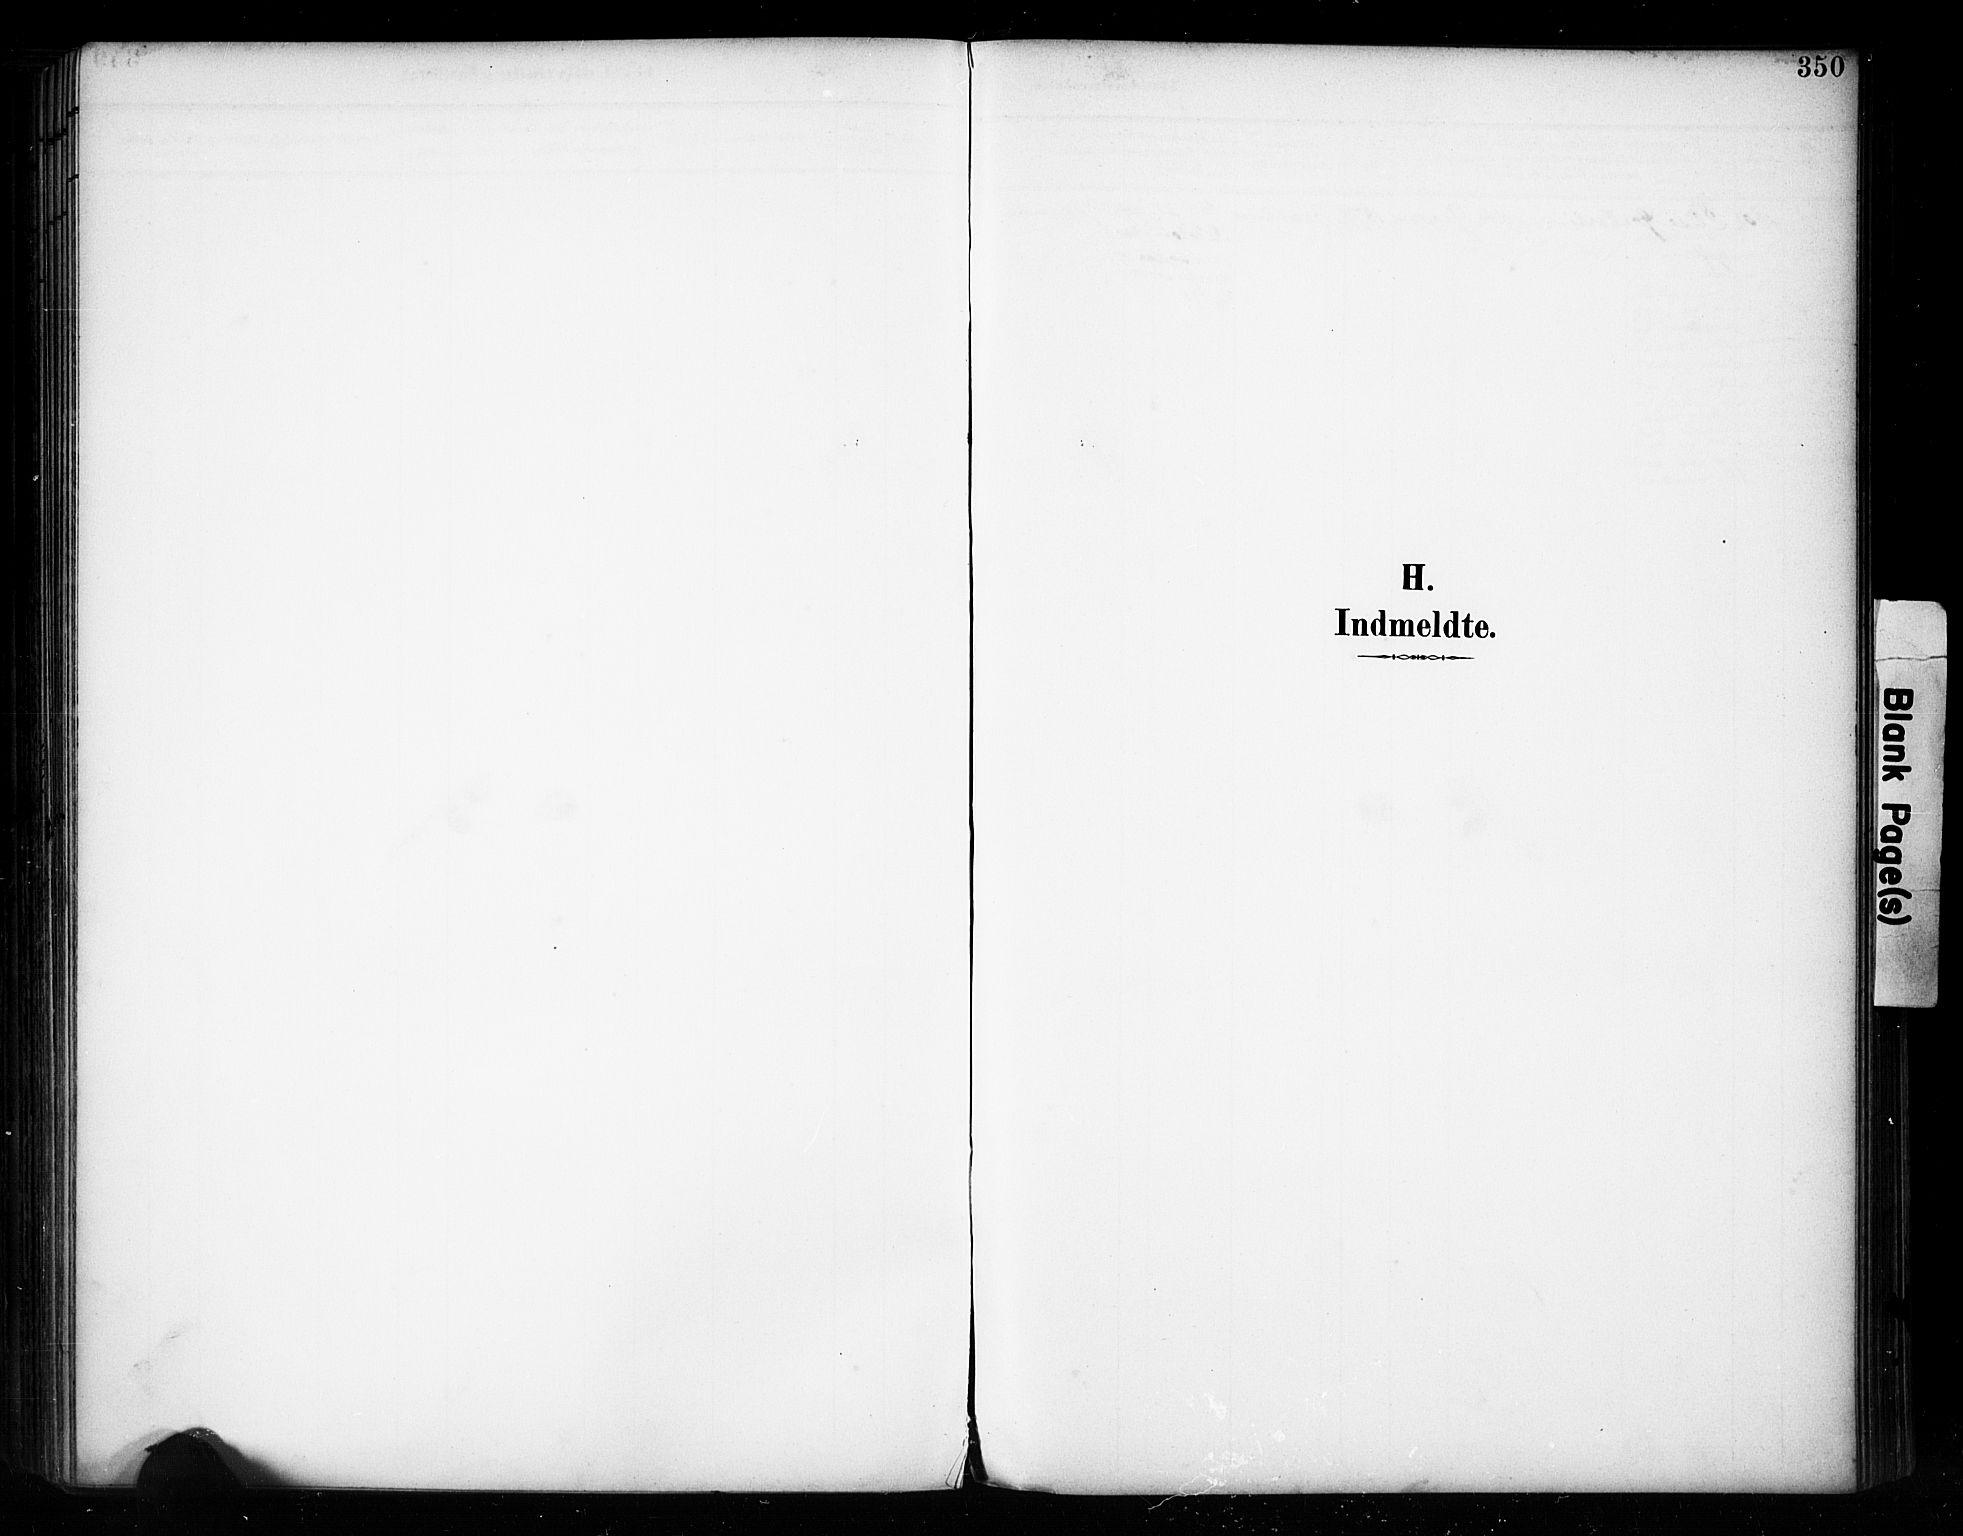 SAH, Vestre Toten prestekontor, H/Ha/Haa/L0011: Ministerialbok nr. 11, 1895-1906, s. 350